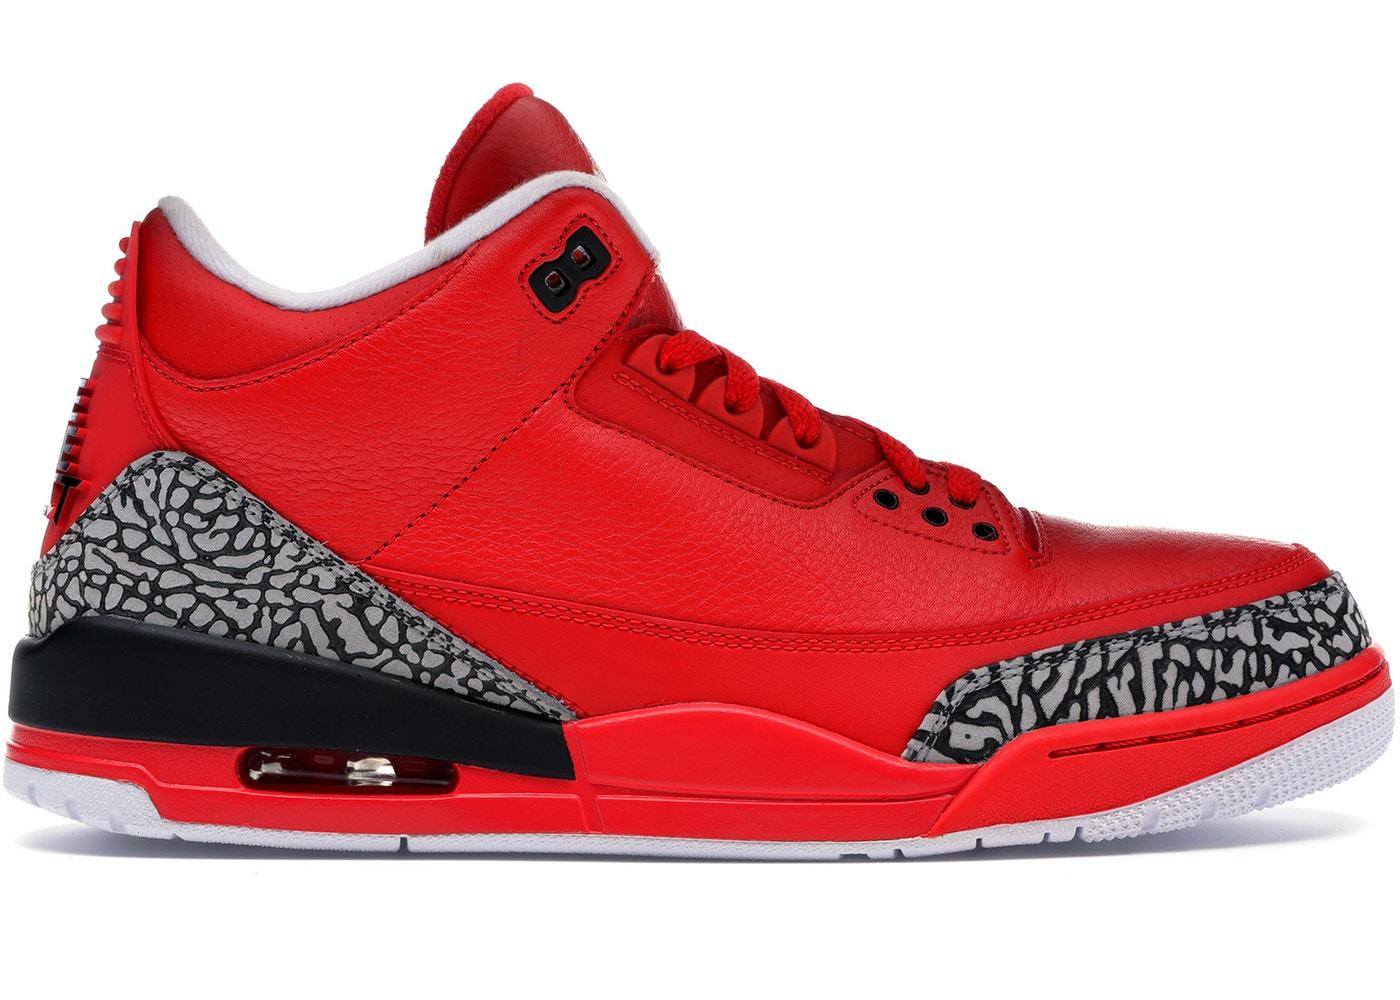 Air Jordan 3 Retro DJ Khaled Grateful price